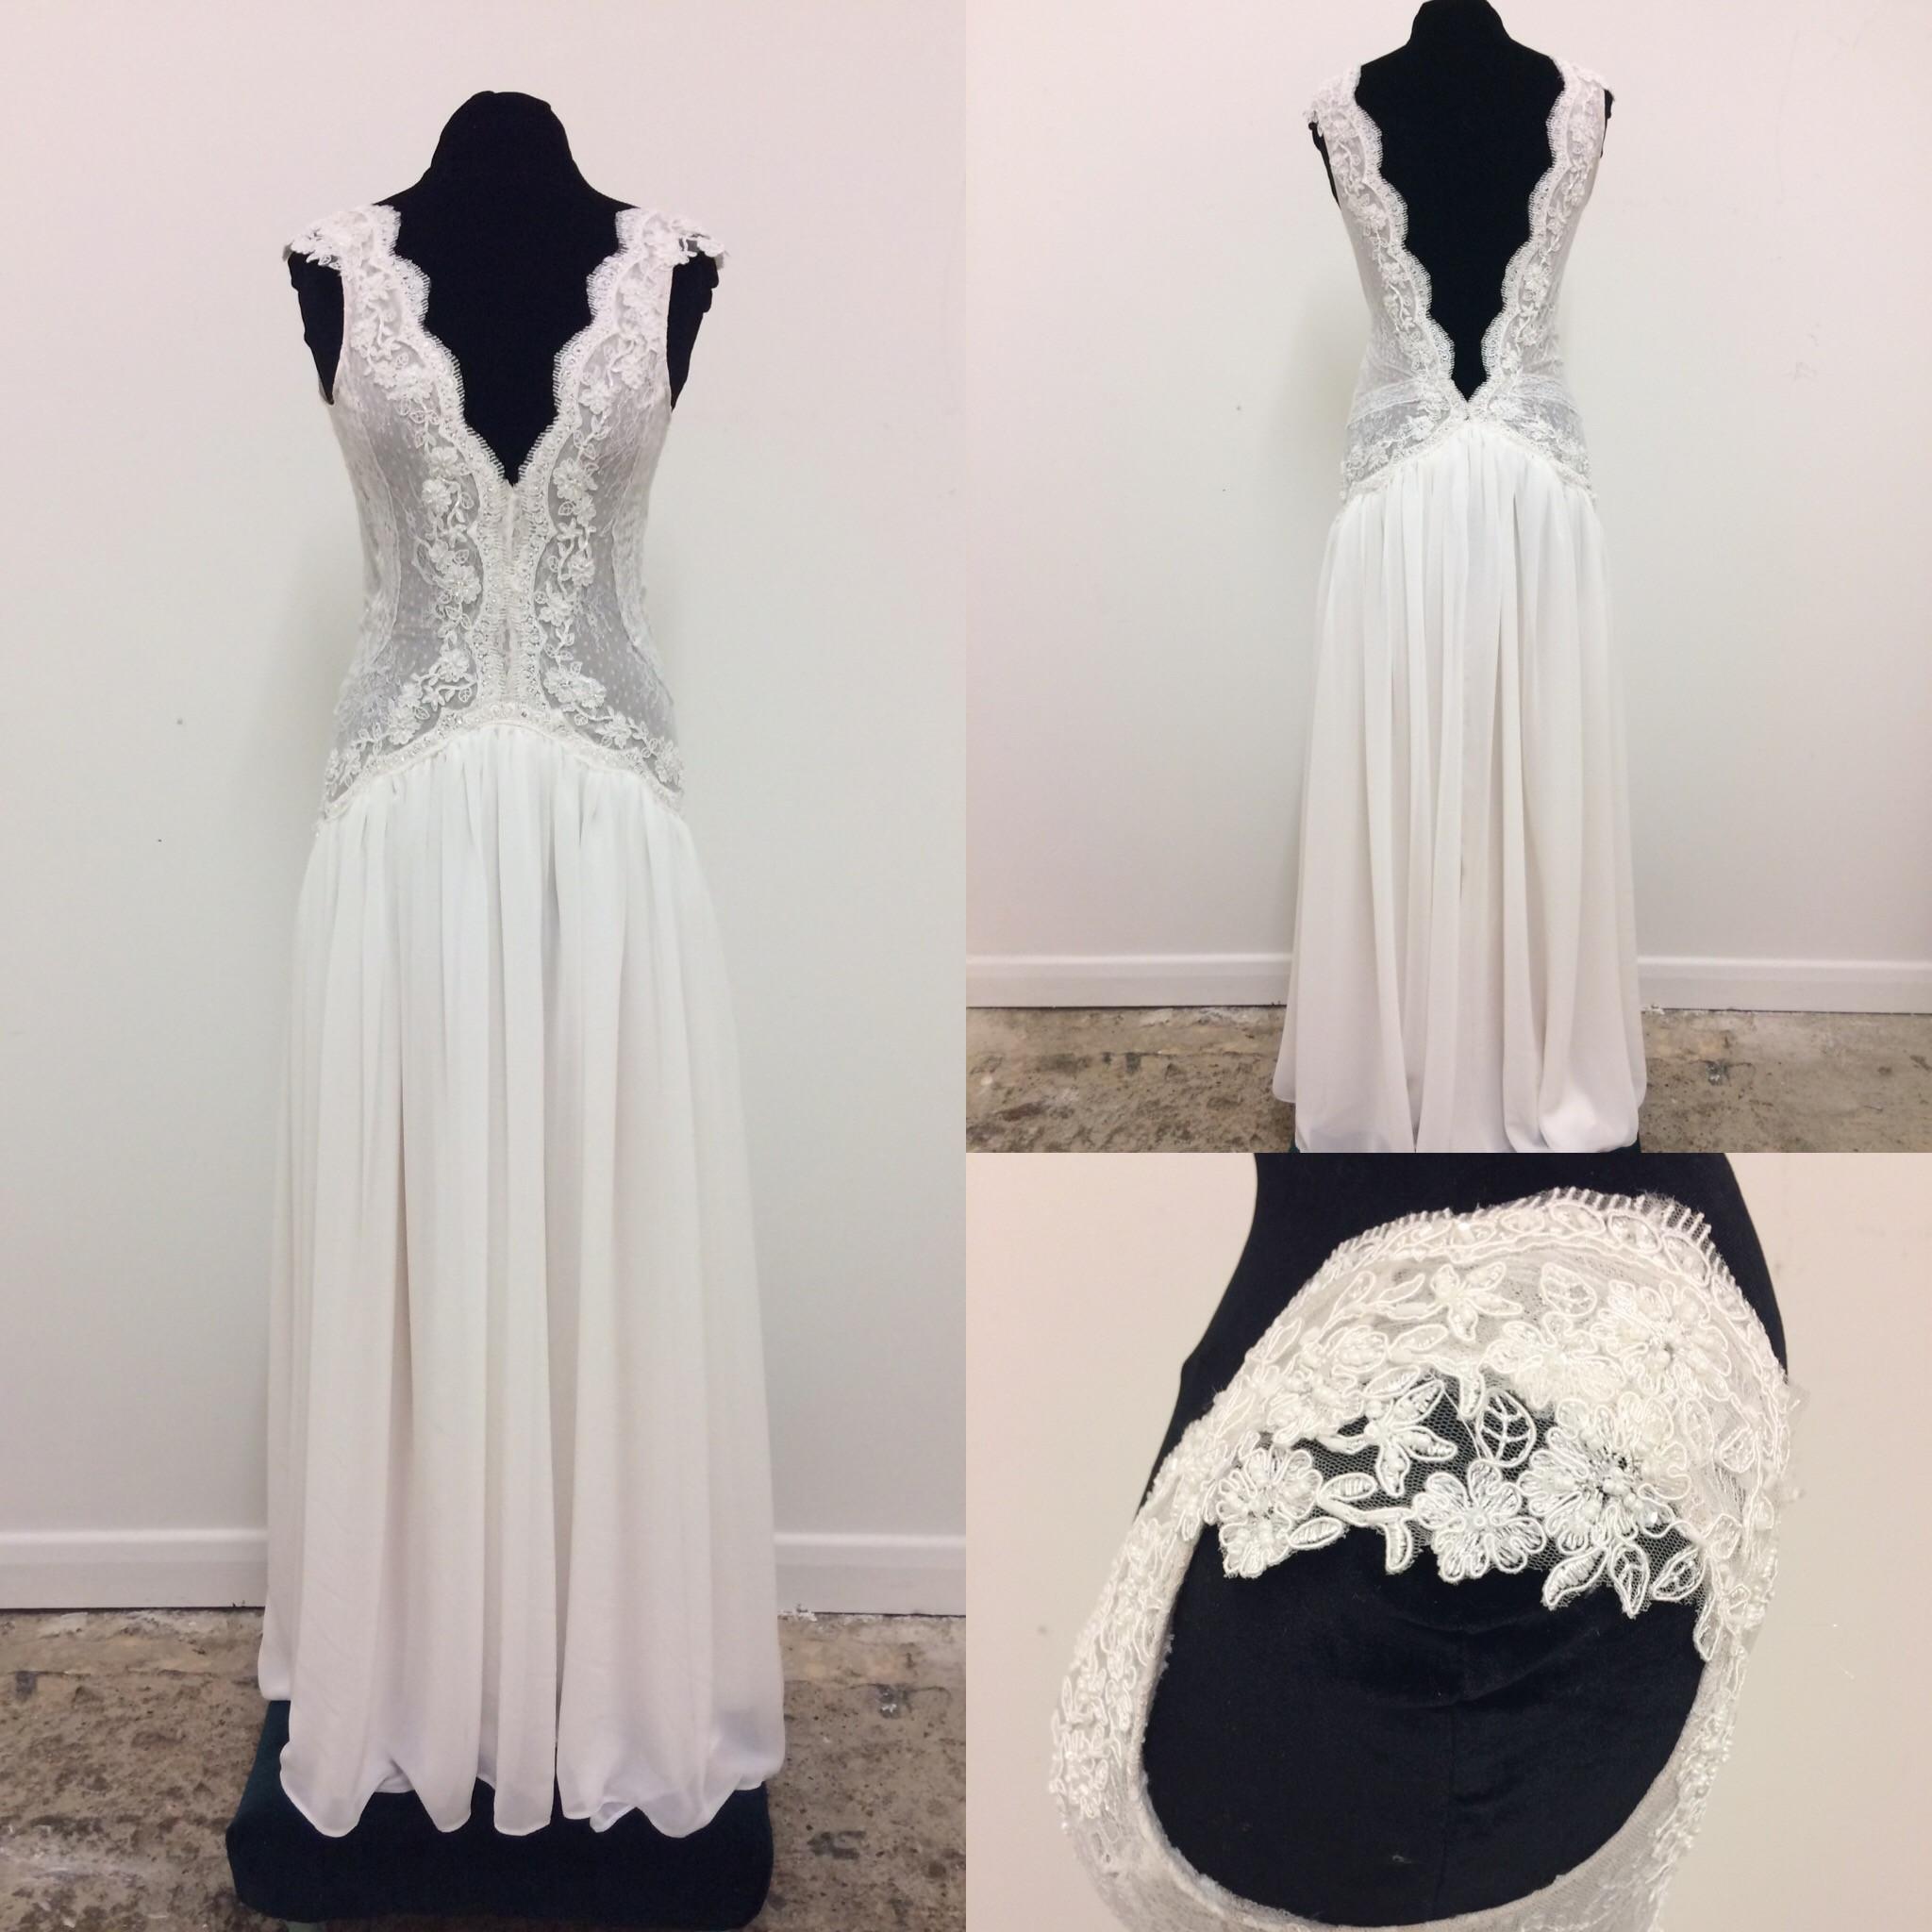 Stunning Boho Wedding Dress Delicate Layered Lace With Beautiful